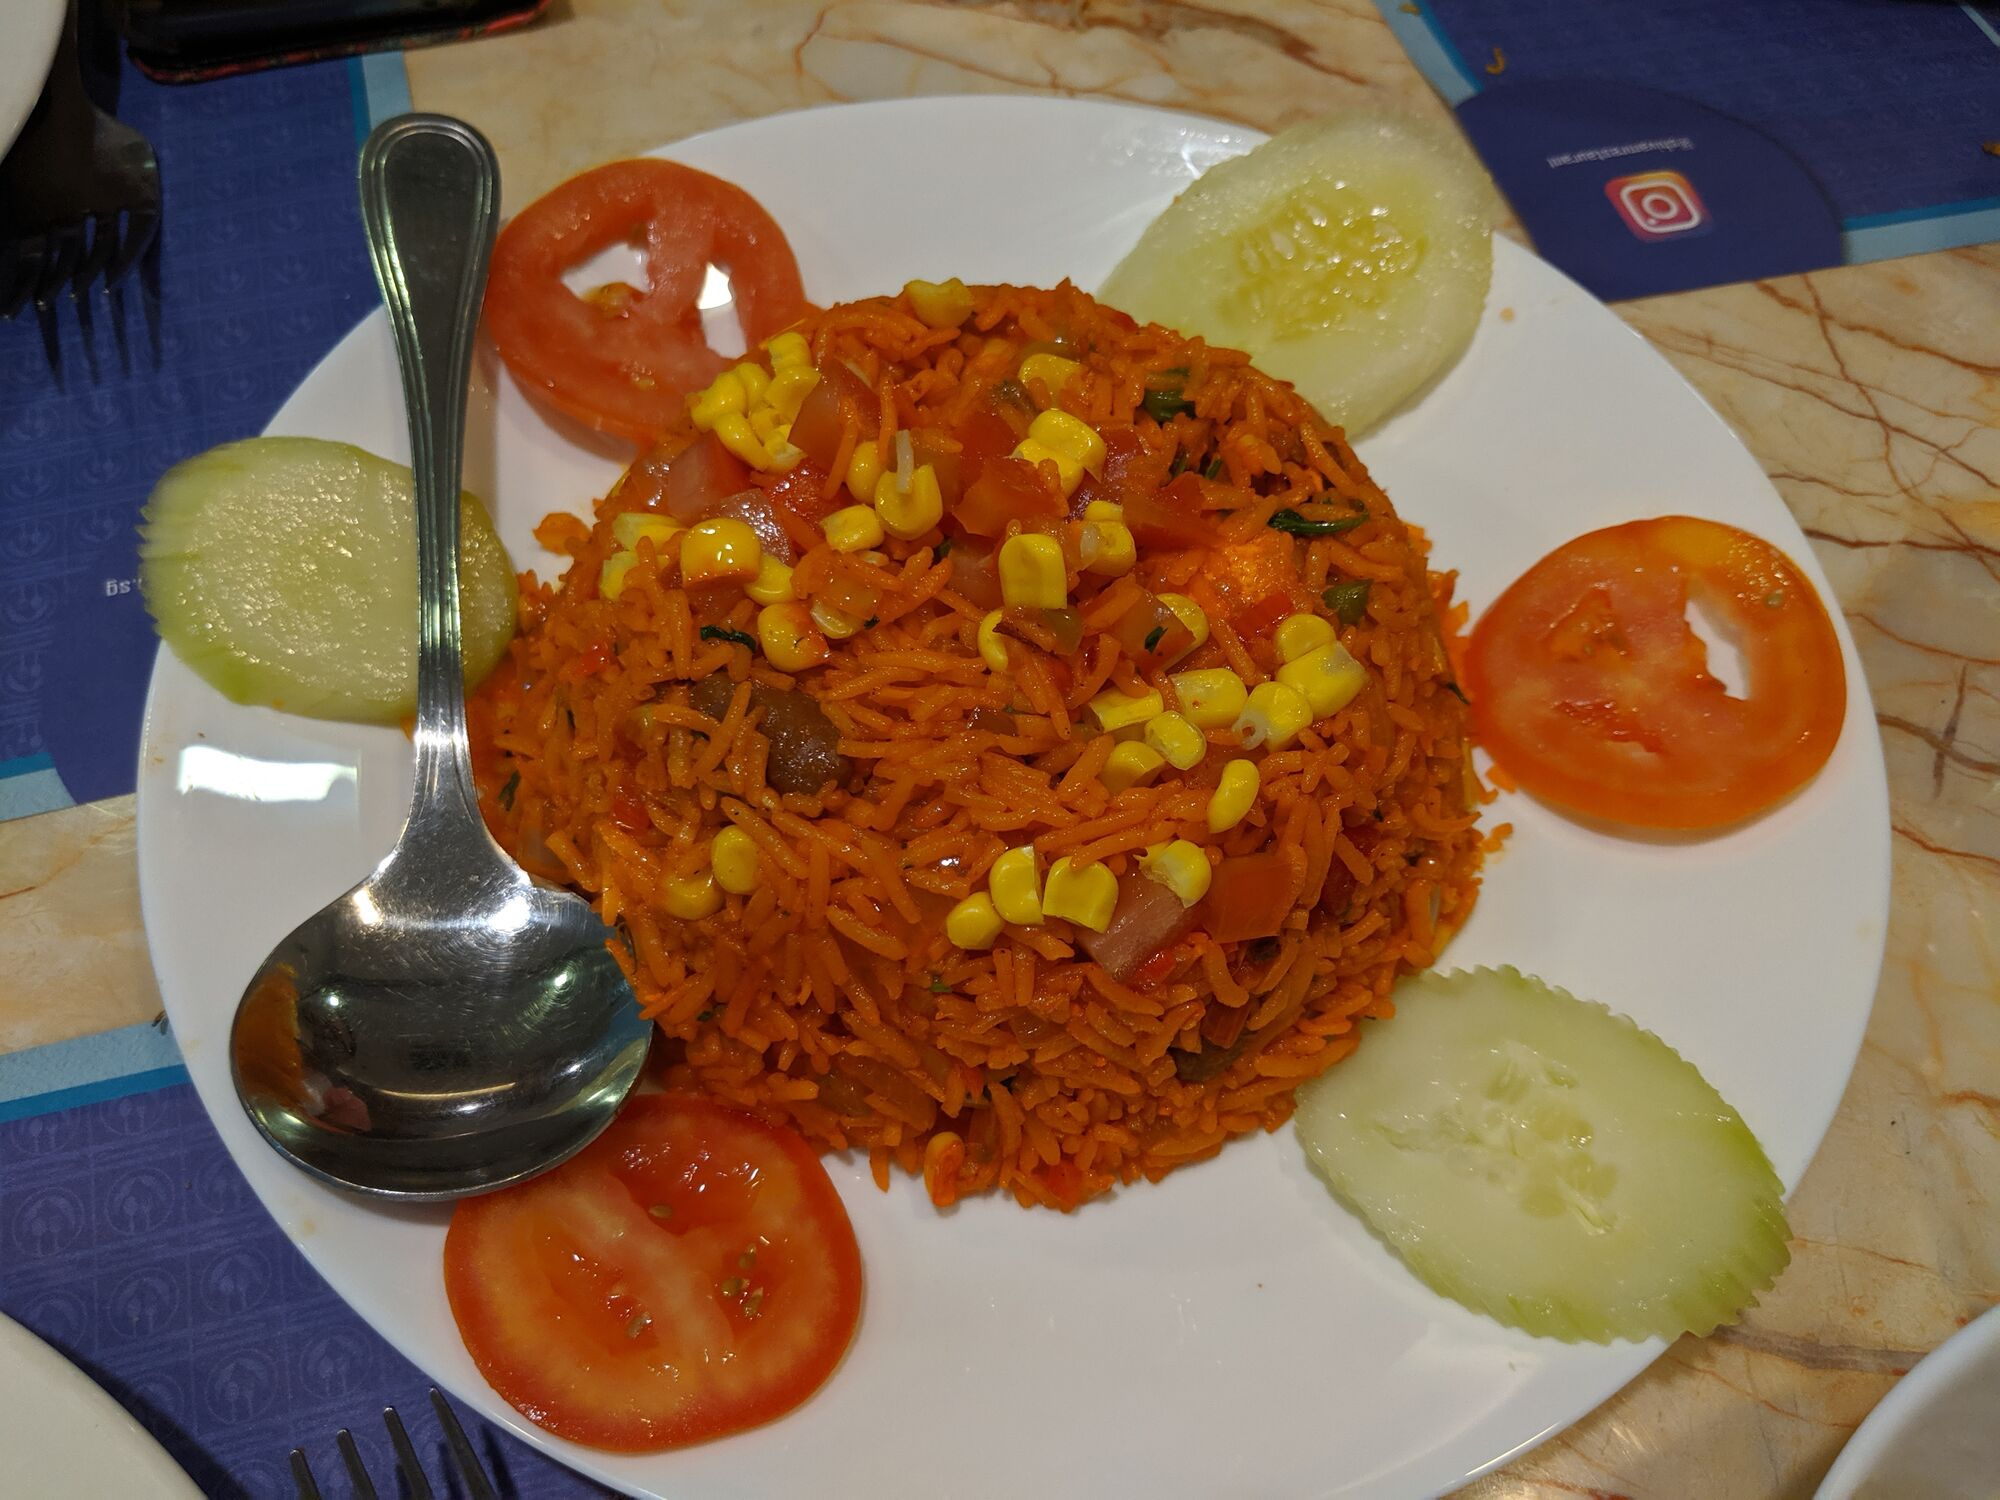 Shivam Restaurant - Fried Rice - Good & Tasty food here